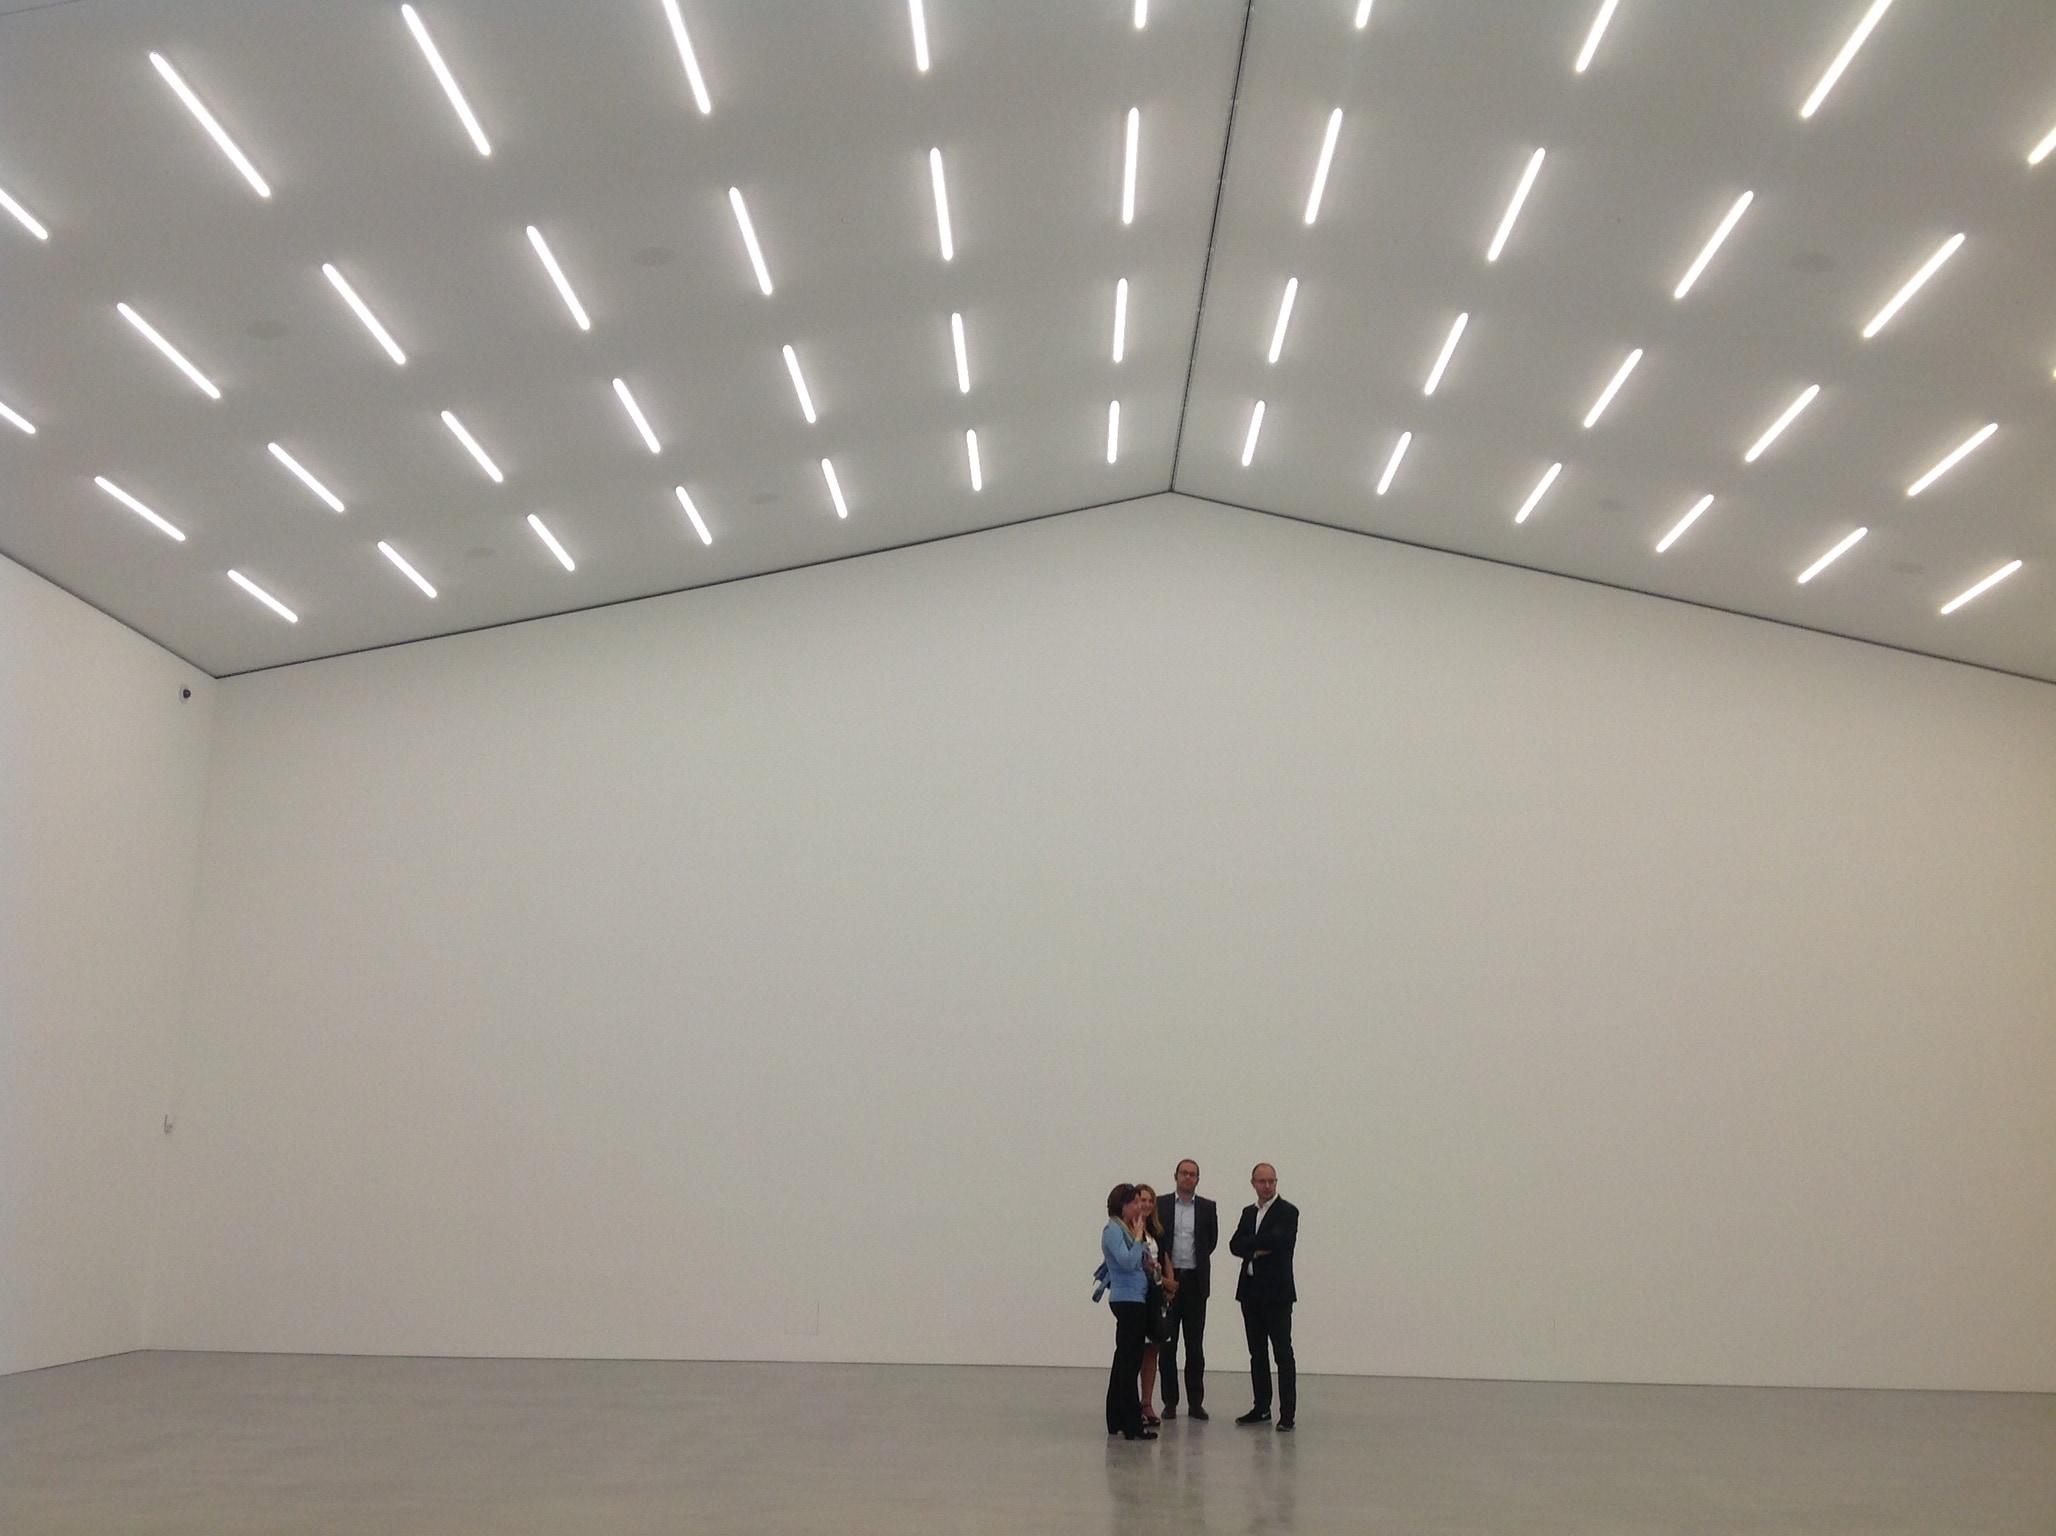 Herzog & de Meuron per un nuovo edificio al Campus Vitra